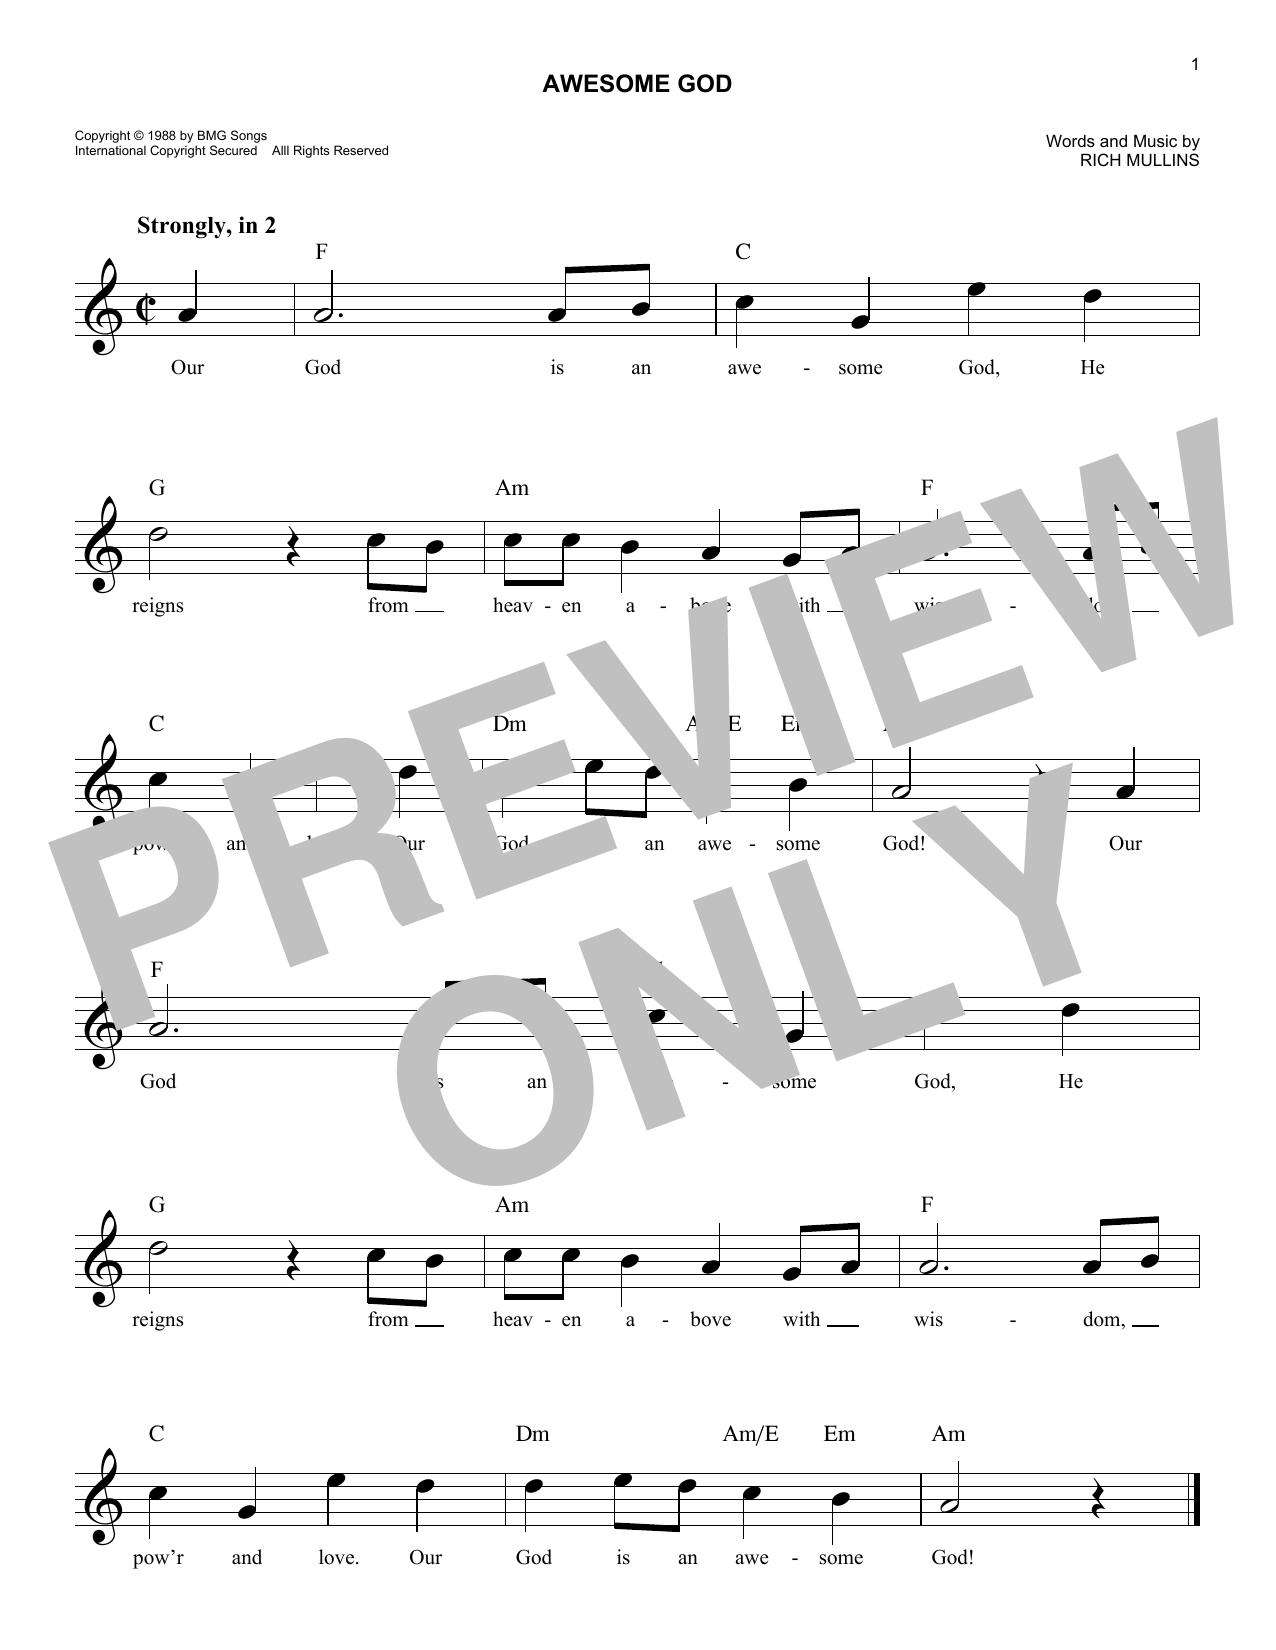 Awesome God Sheet Music Rich Mullins Melody Line Lyrics Chords